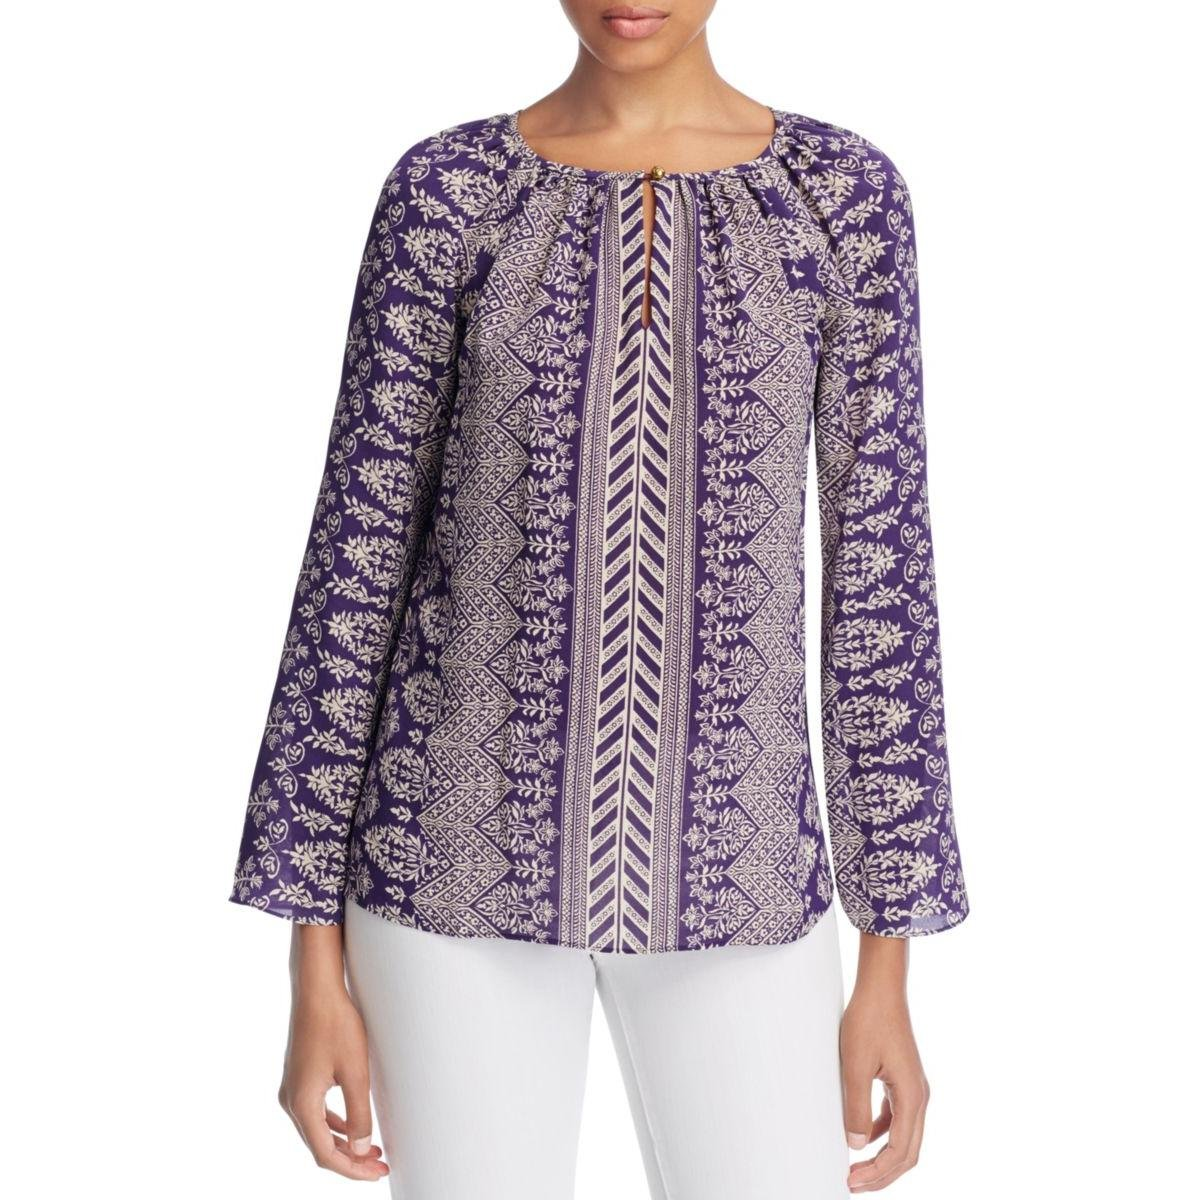 Tory Burch Womens Silk Printed Casual Top Purple 14